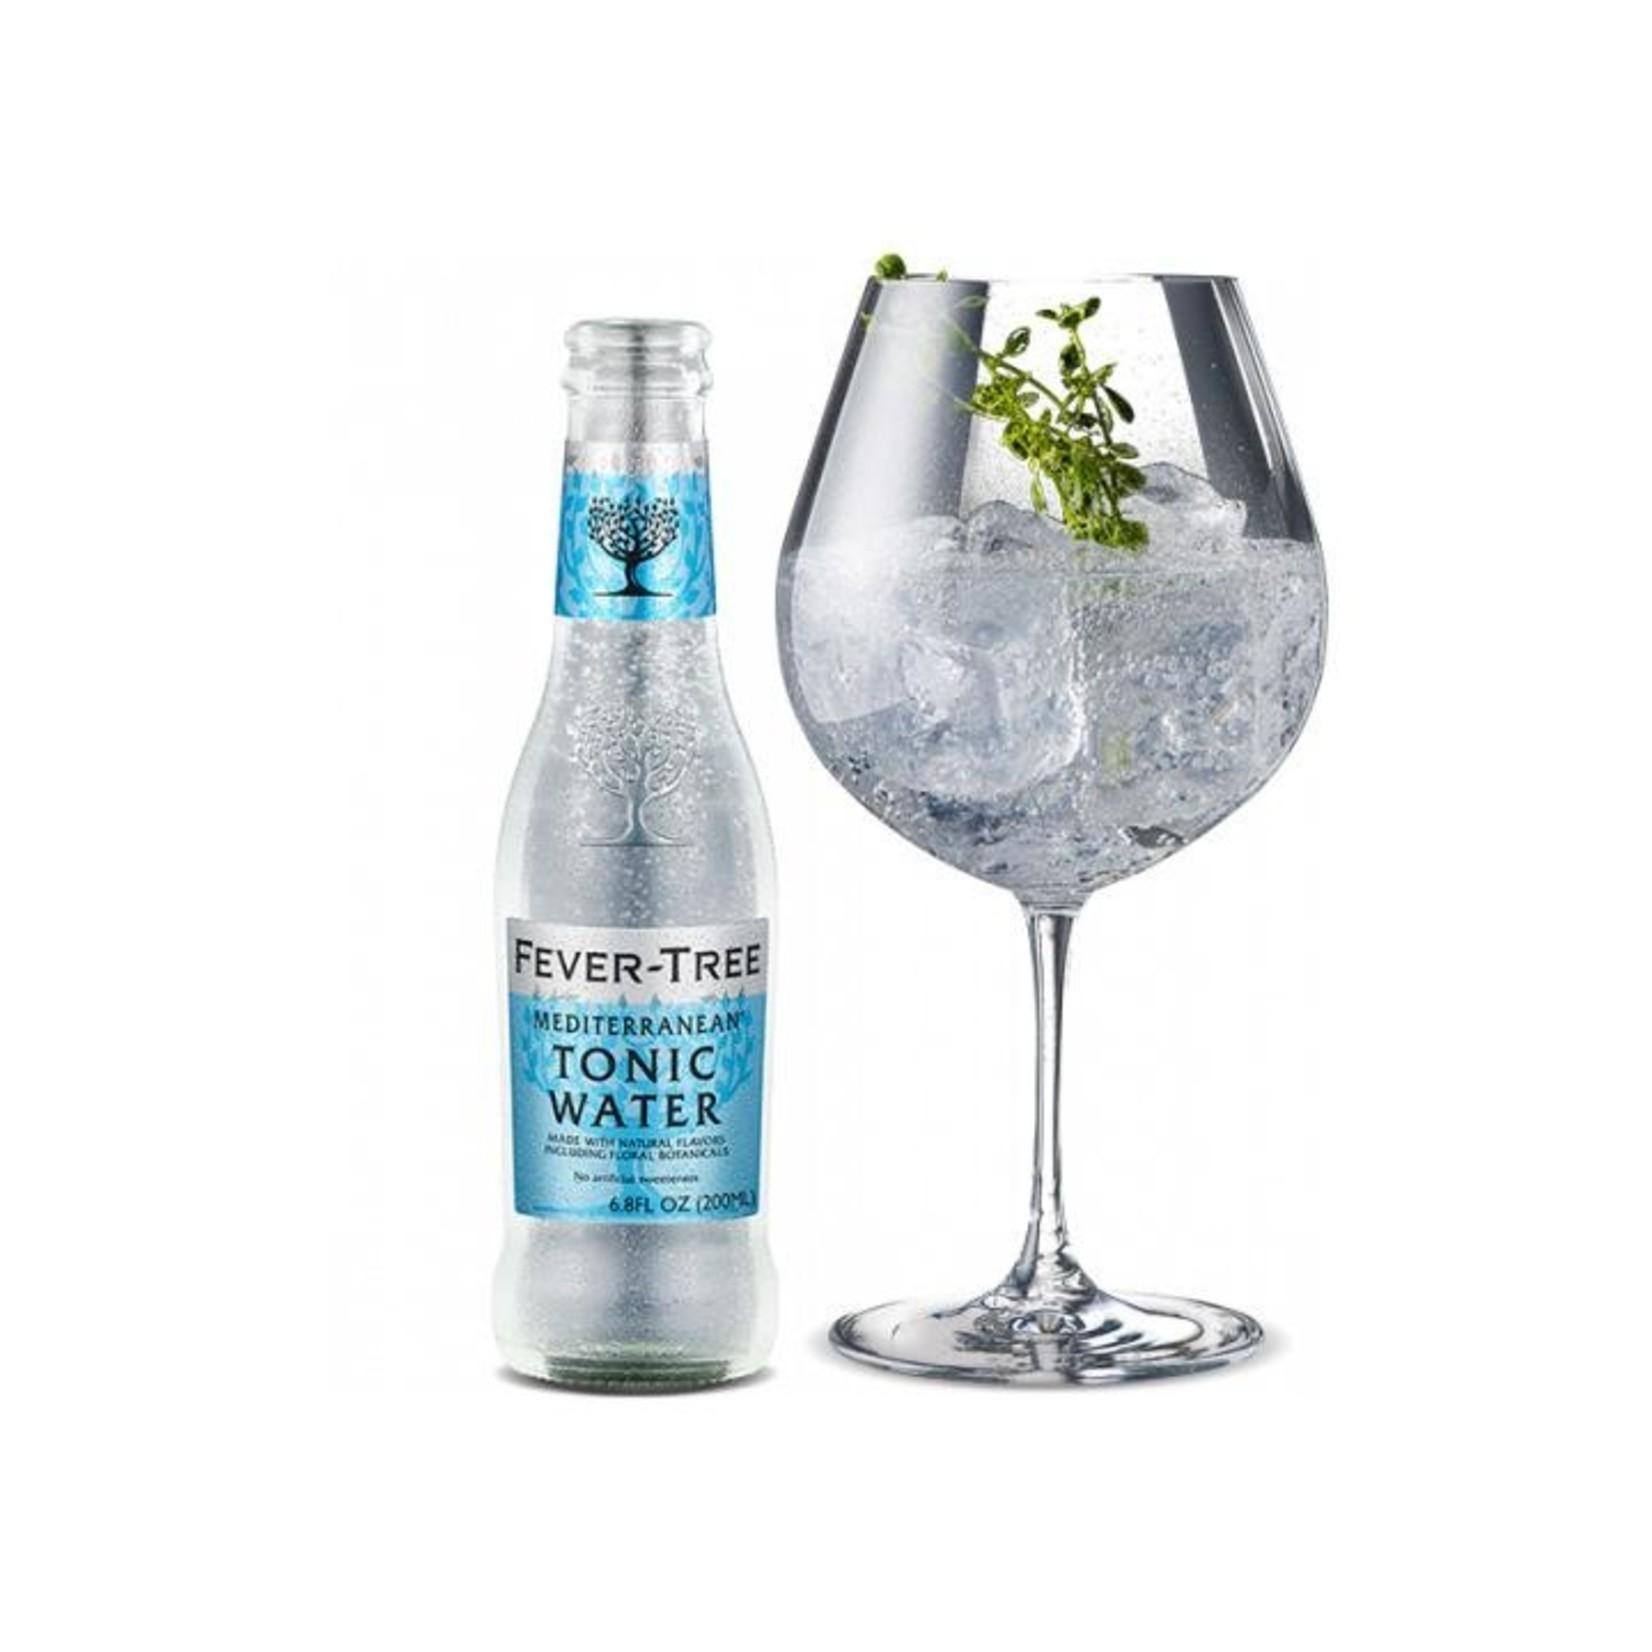 Fever-Tree Fever-Tree  Mediterranean Tonic Water